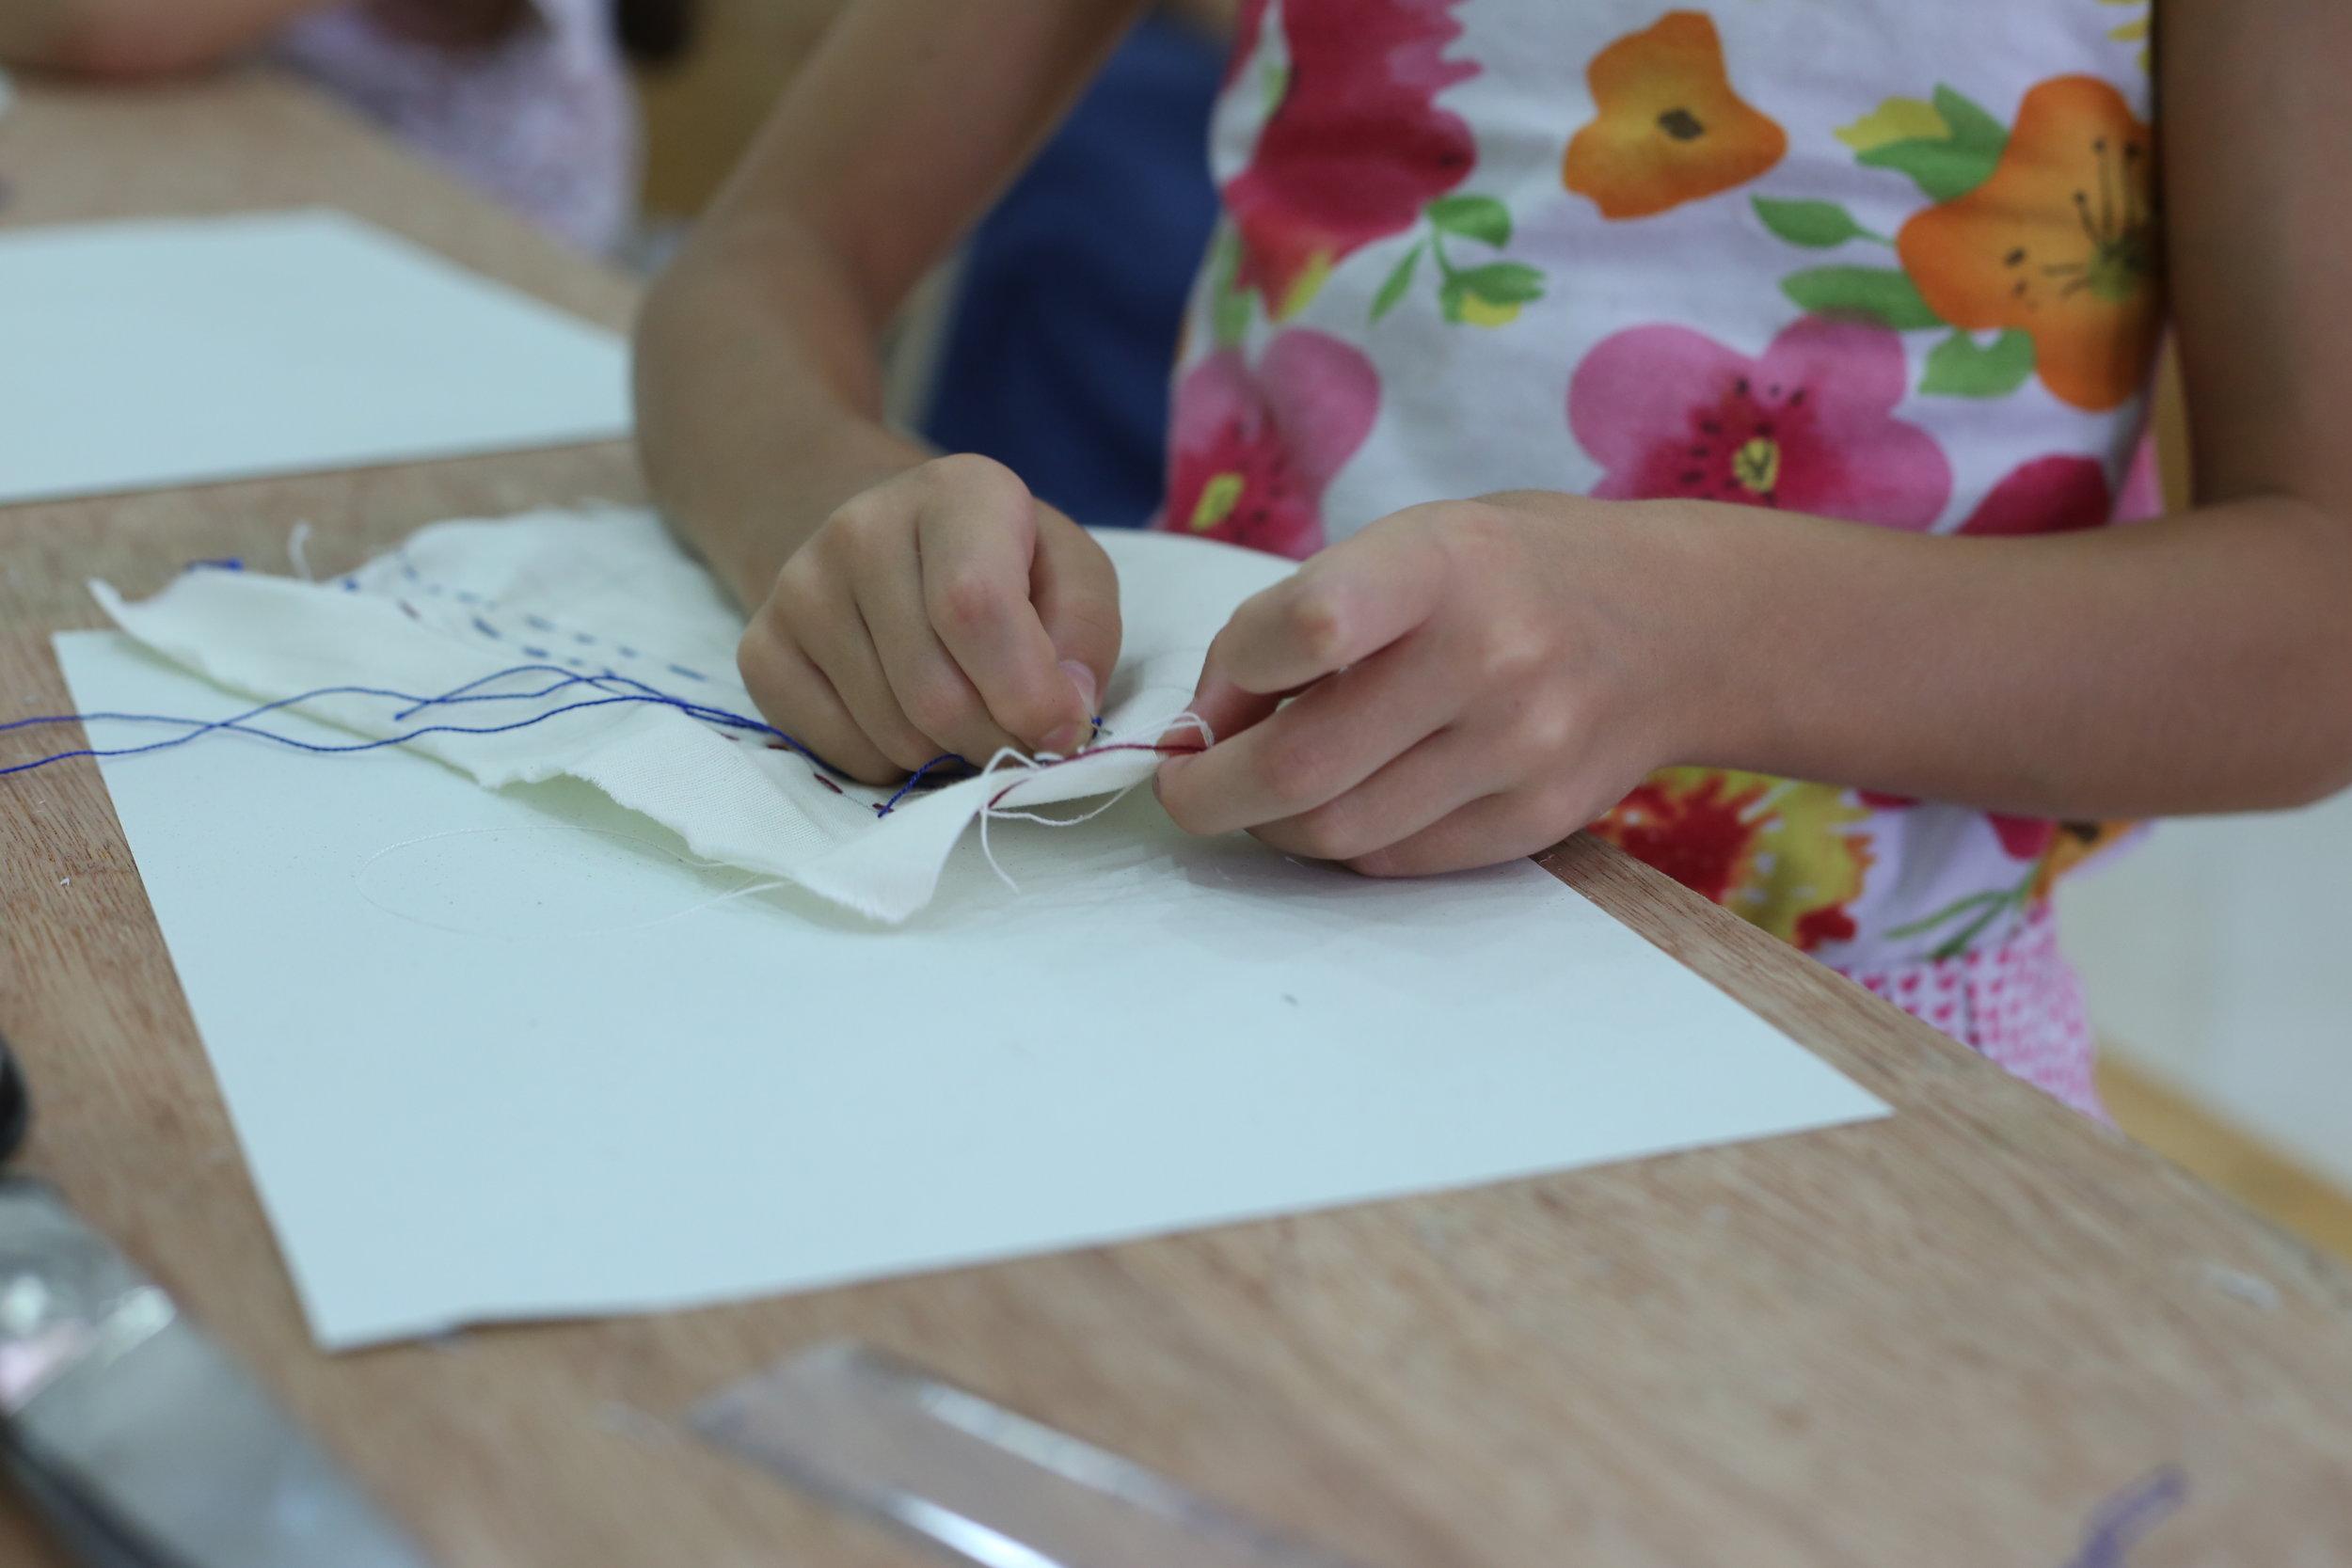 Klabb Ċekcik  Programme designed for children between the ages of 6 and 10